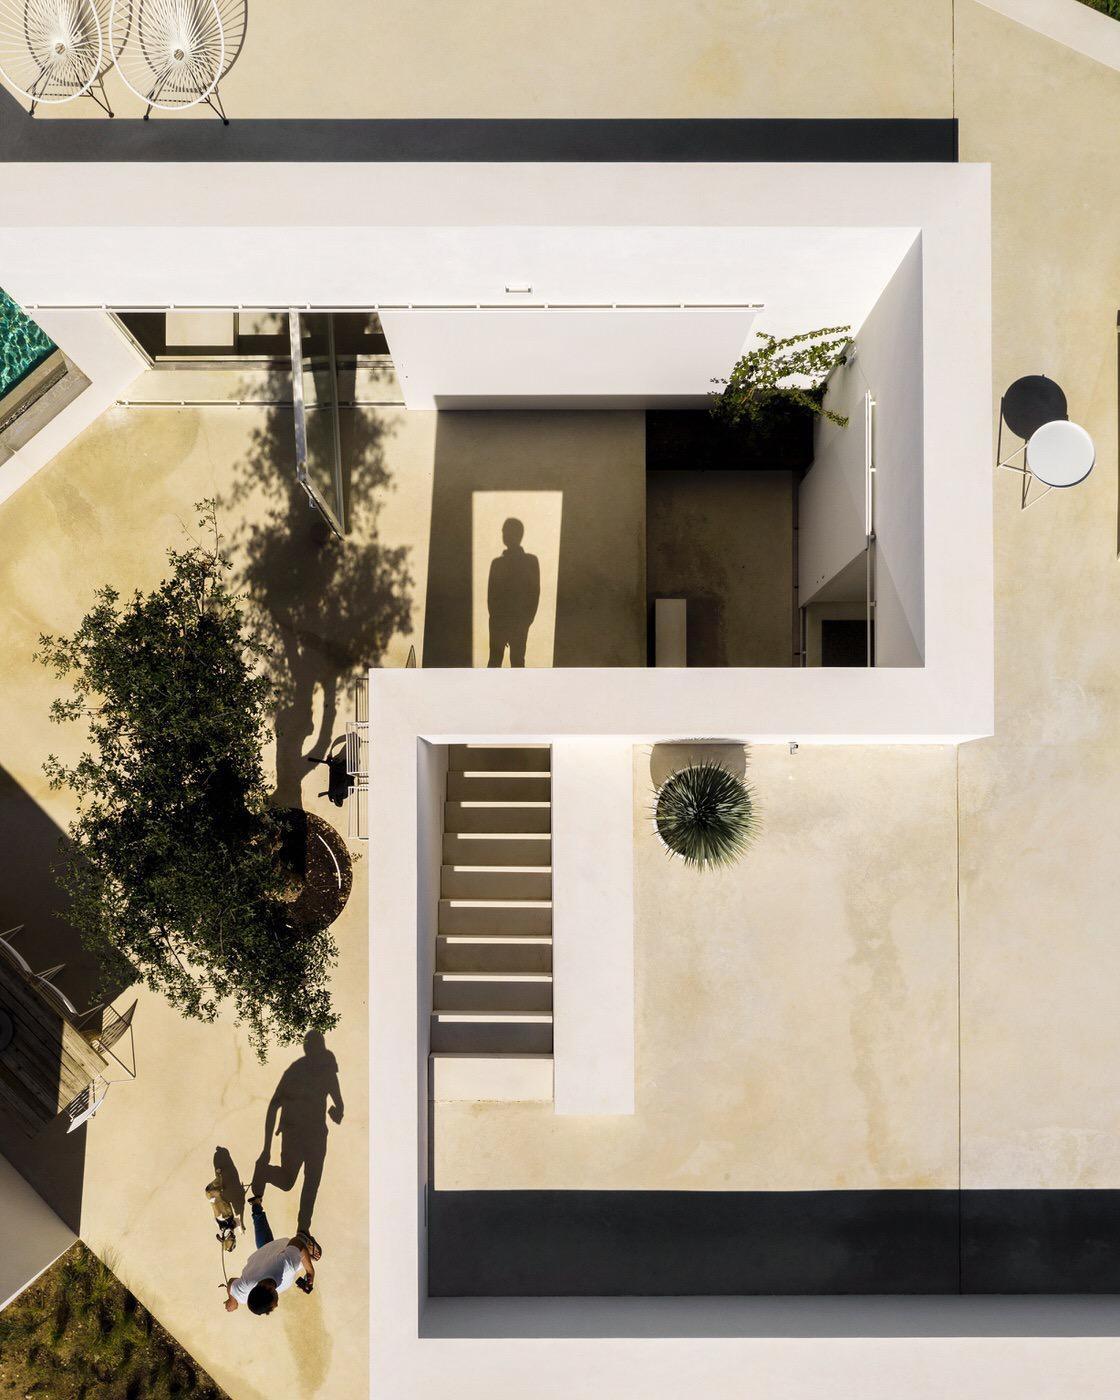 Zalig-Algarve-Casa-Luum-111-1_1